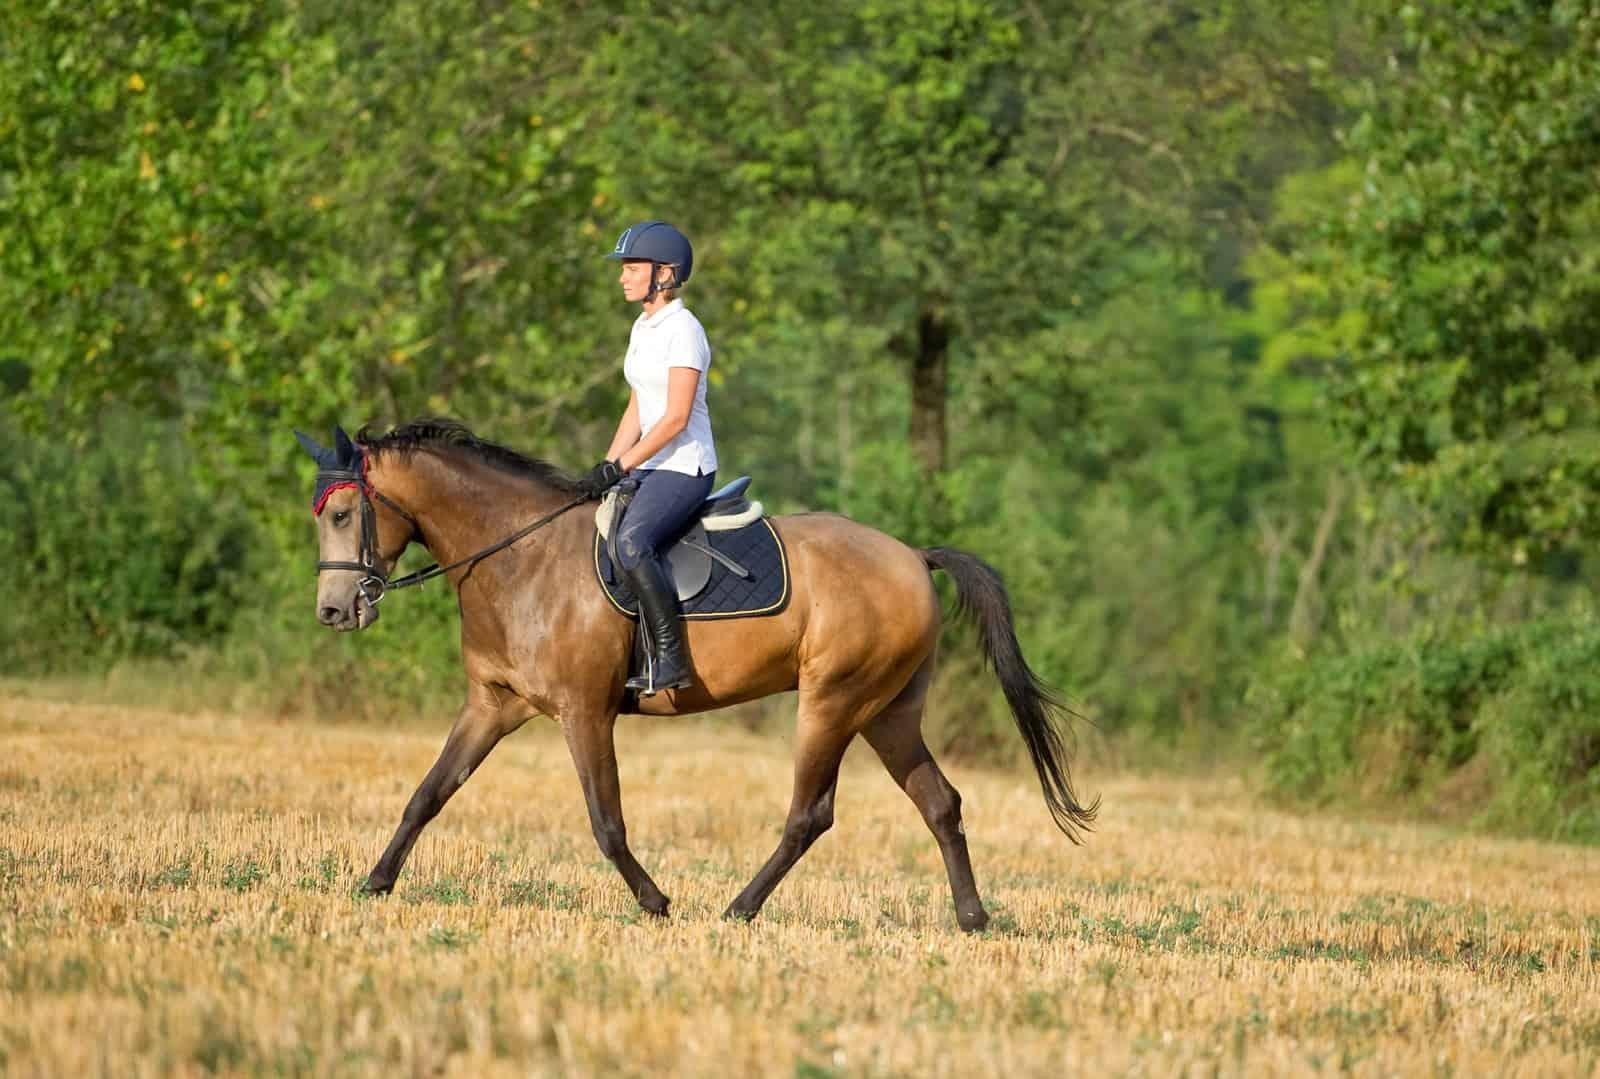 Conditioning Horses for Peak Performance